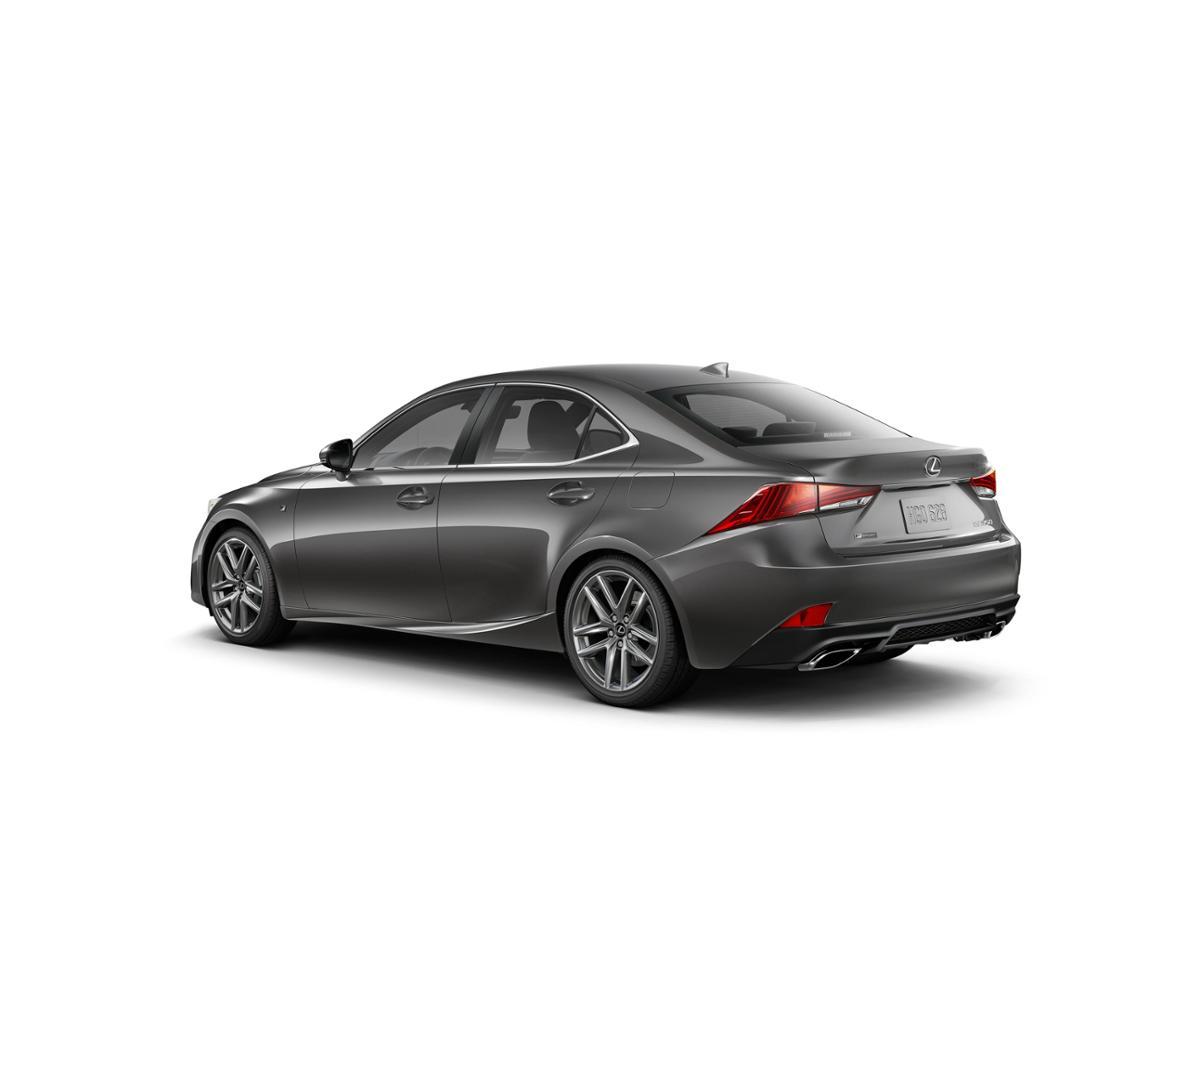 2017 Lexus Is 350 At Lexus Santa Monica Jthbe1d2xh5030986